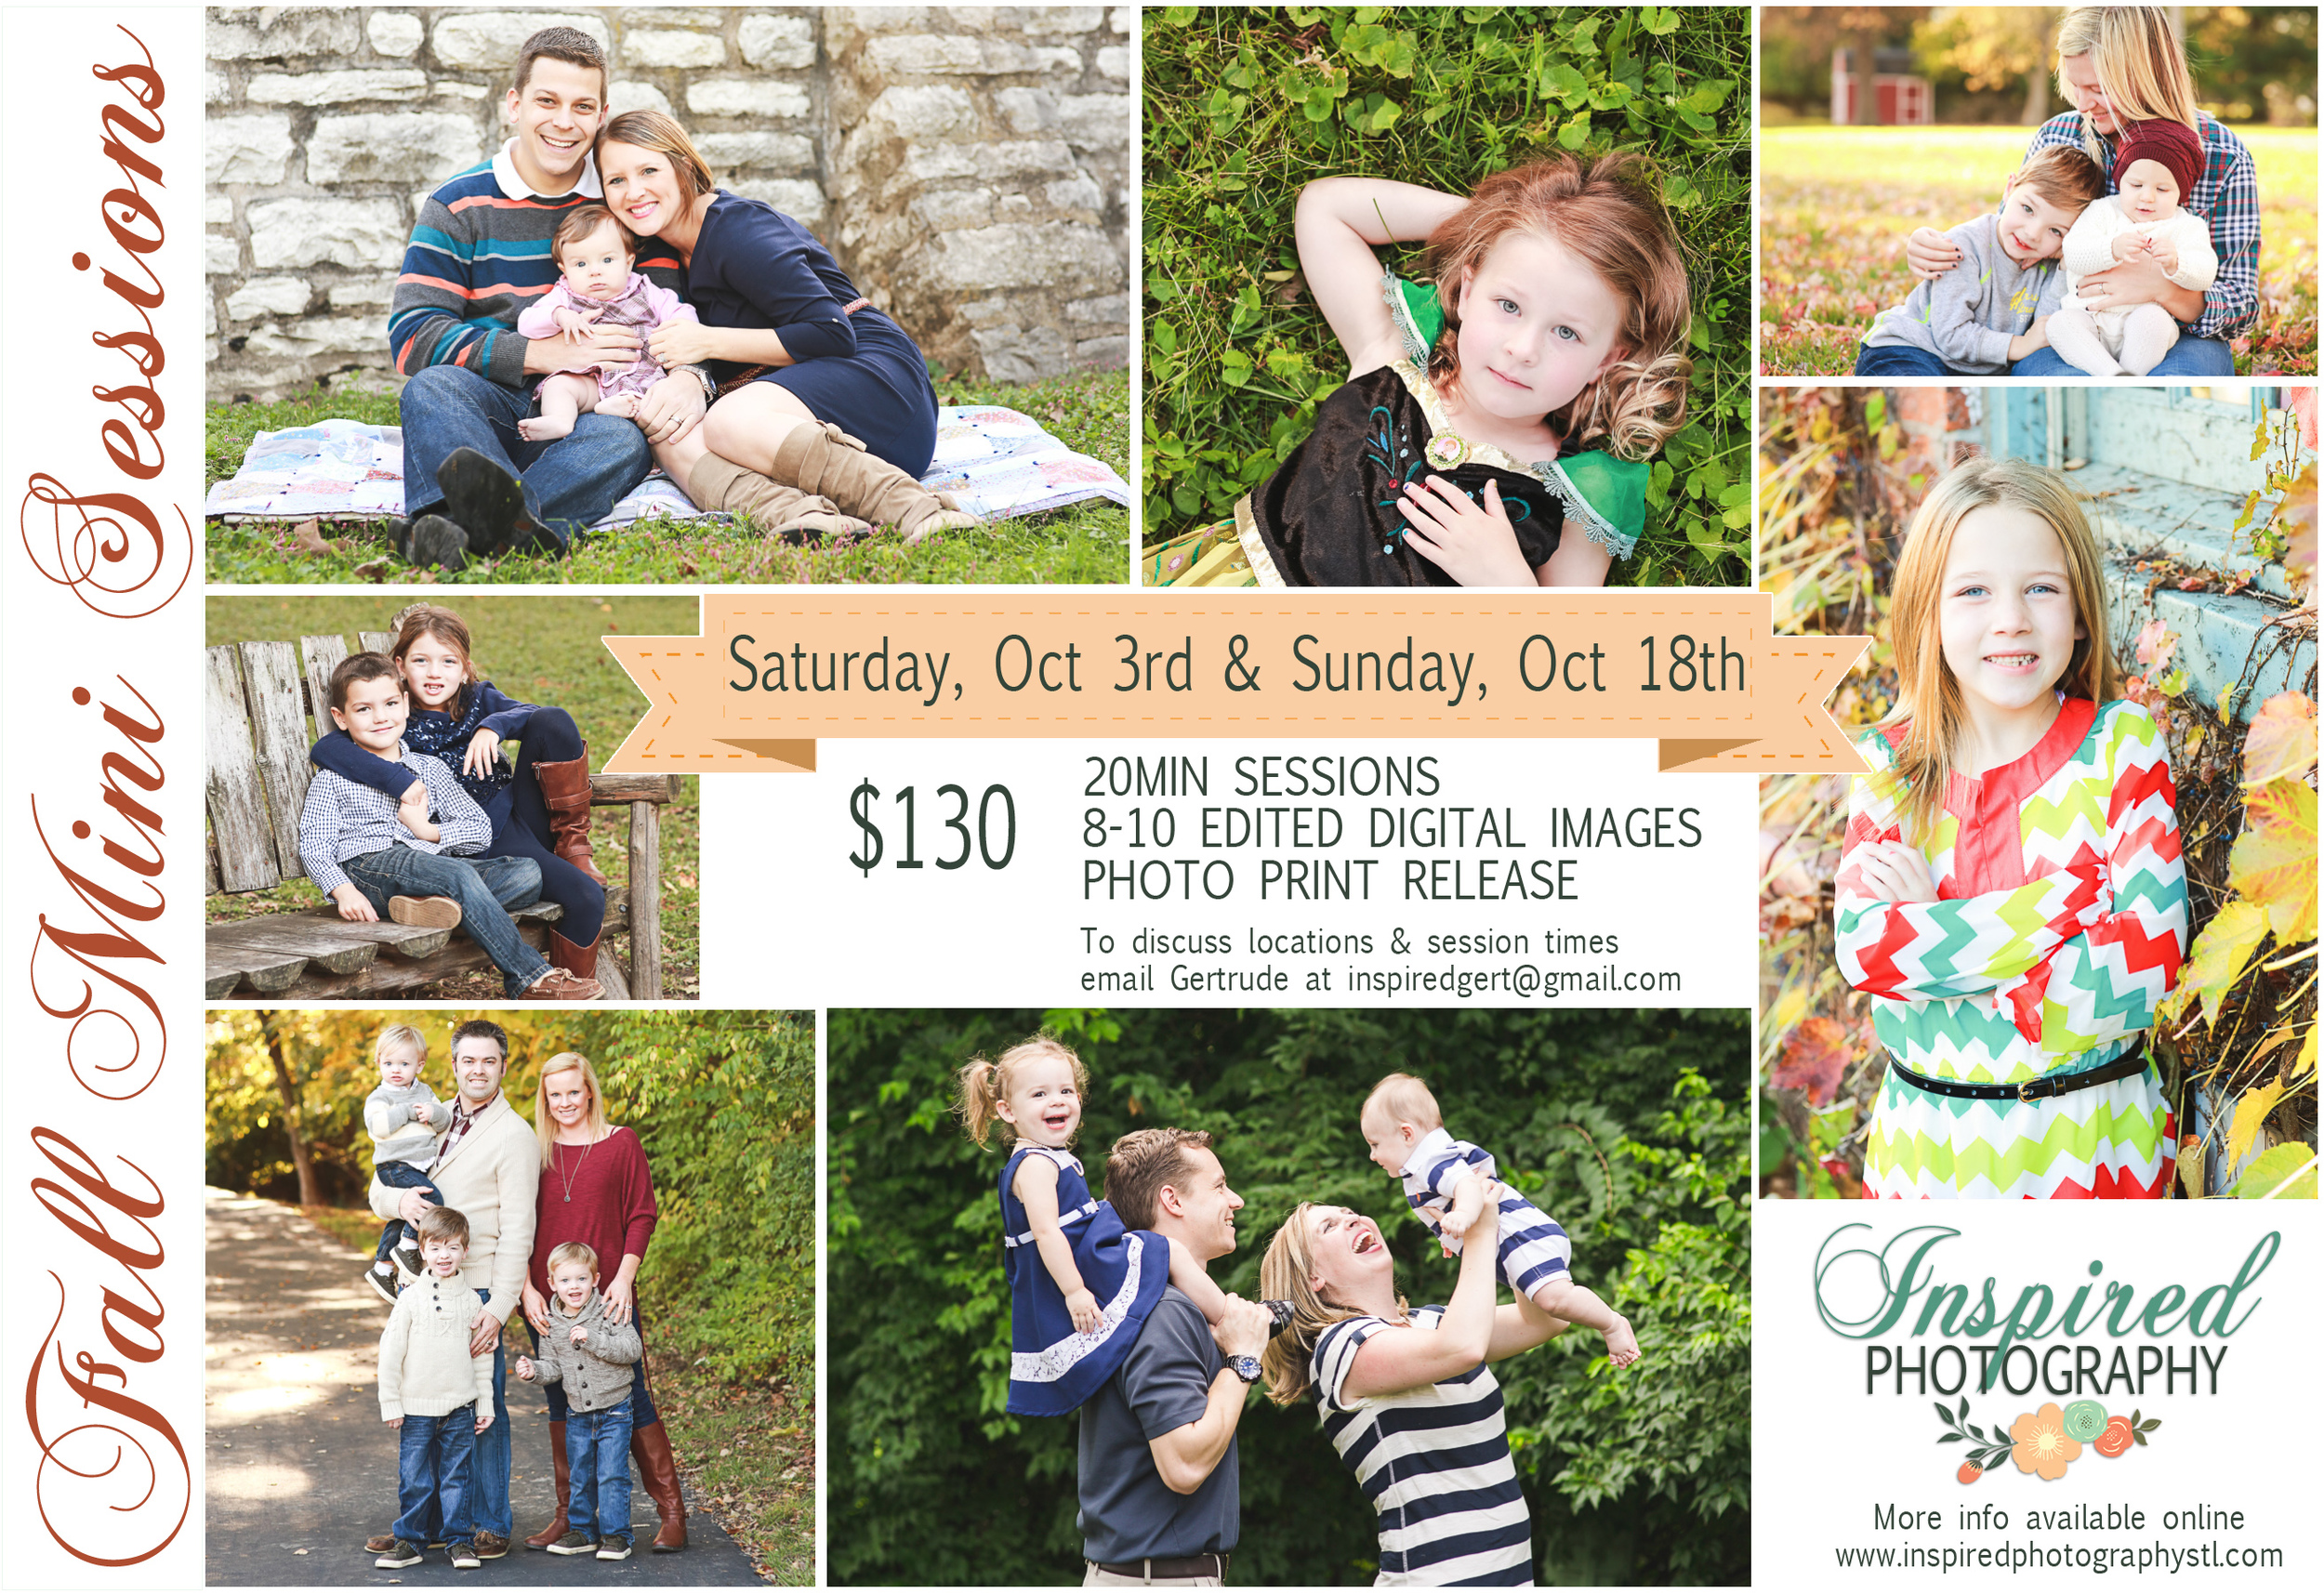 St. Louis Fall Family Mini Portrait Sessions // www.inspiredphotogrphystl.com